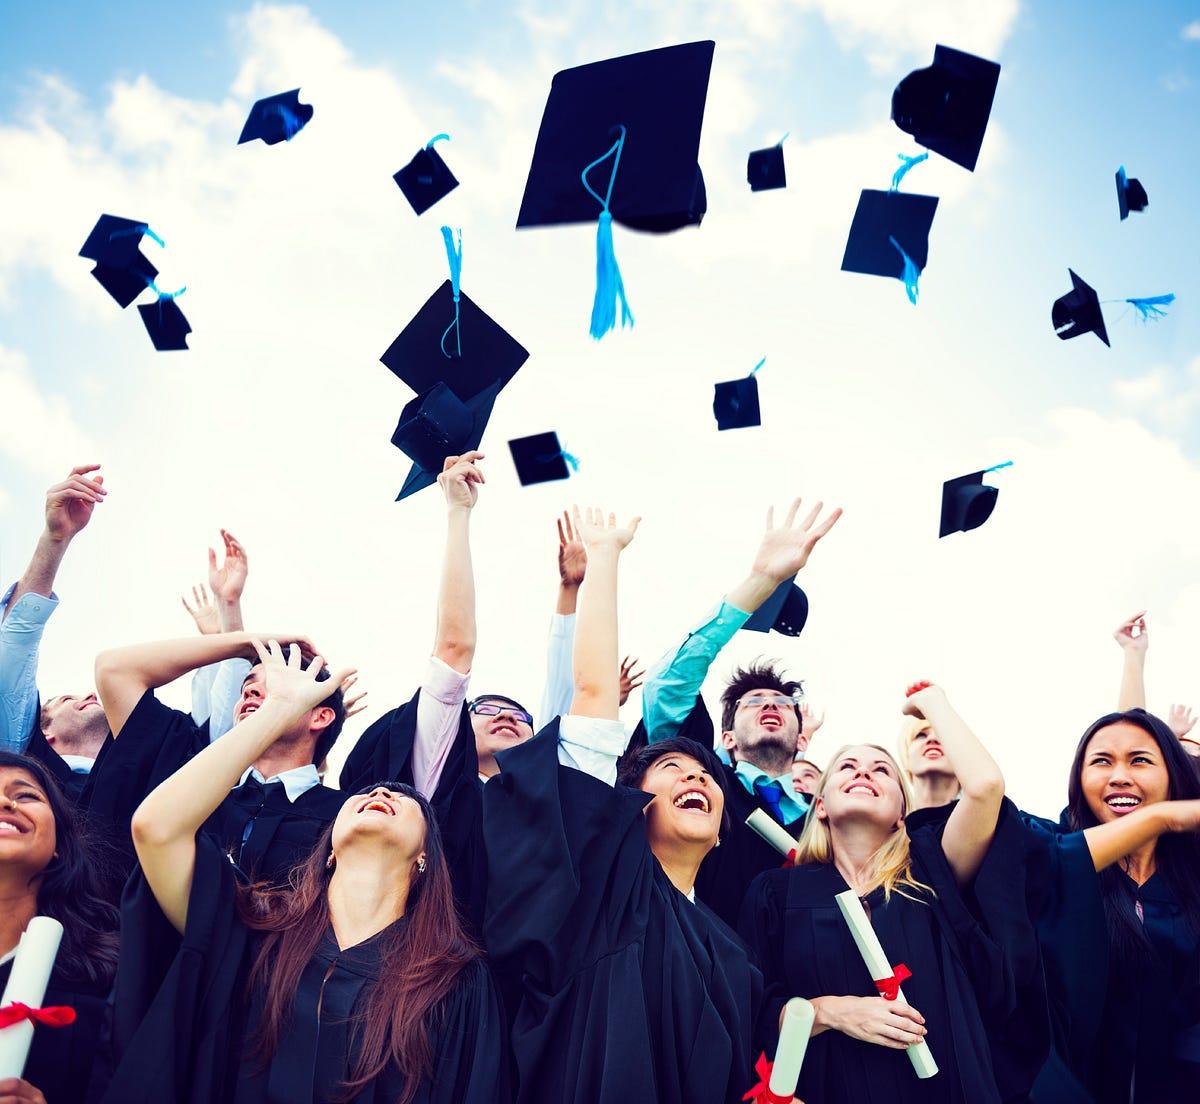 Graduation Day Image Analysis The Day Of High School Students By Ga Hay Stanton Cinema Medium